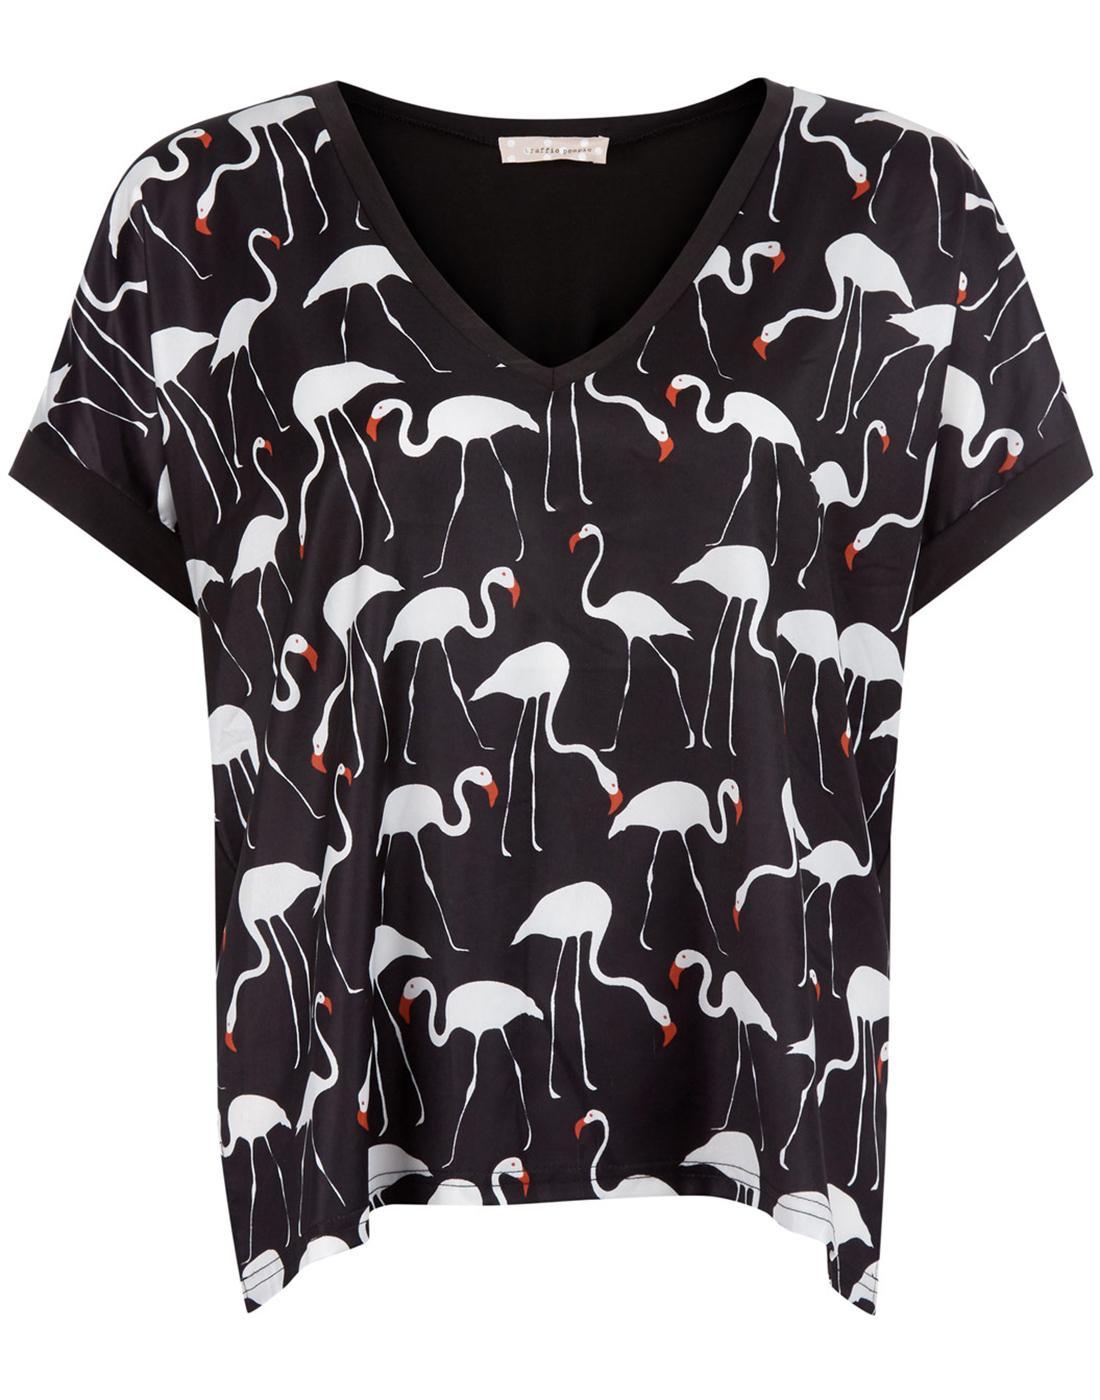 Fantasy of Flamingos TRAFFIC PEOPLE Retro 80s Tee